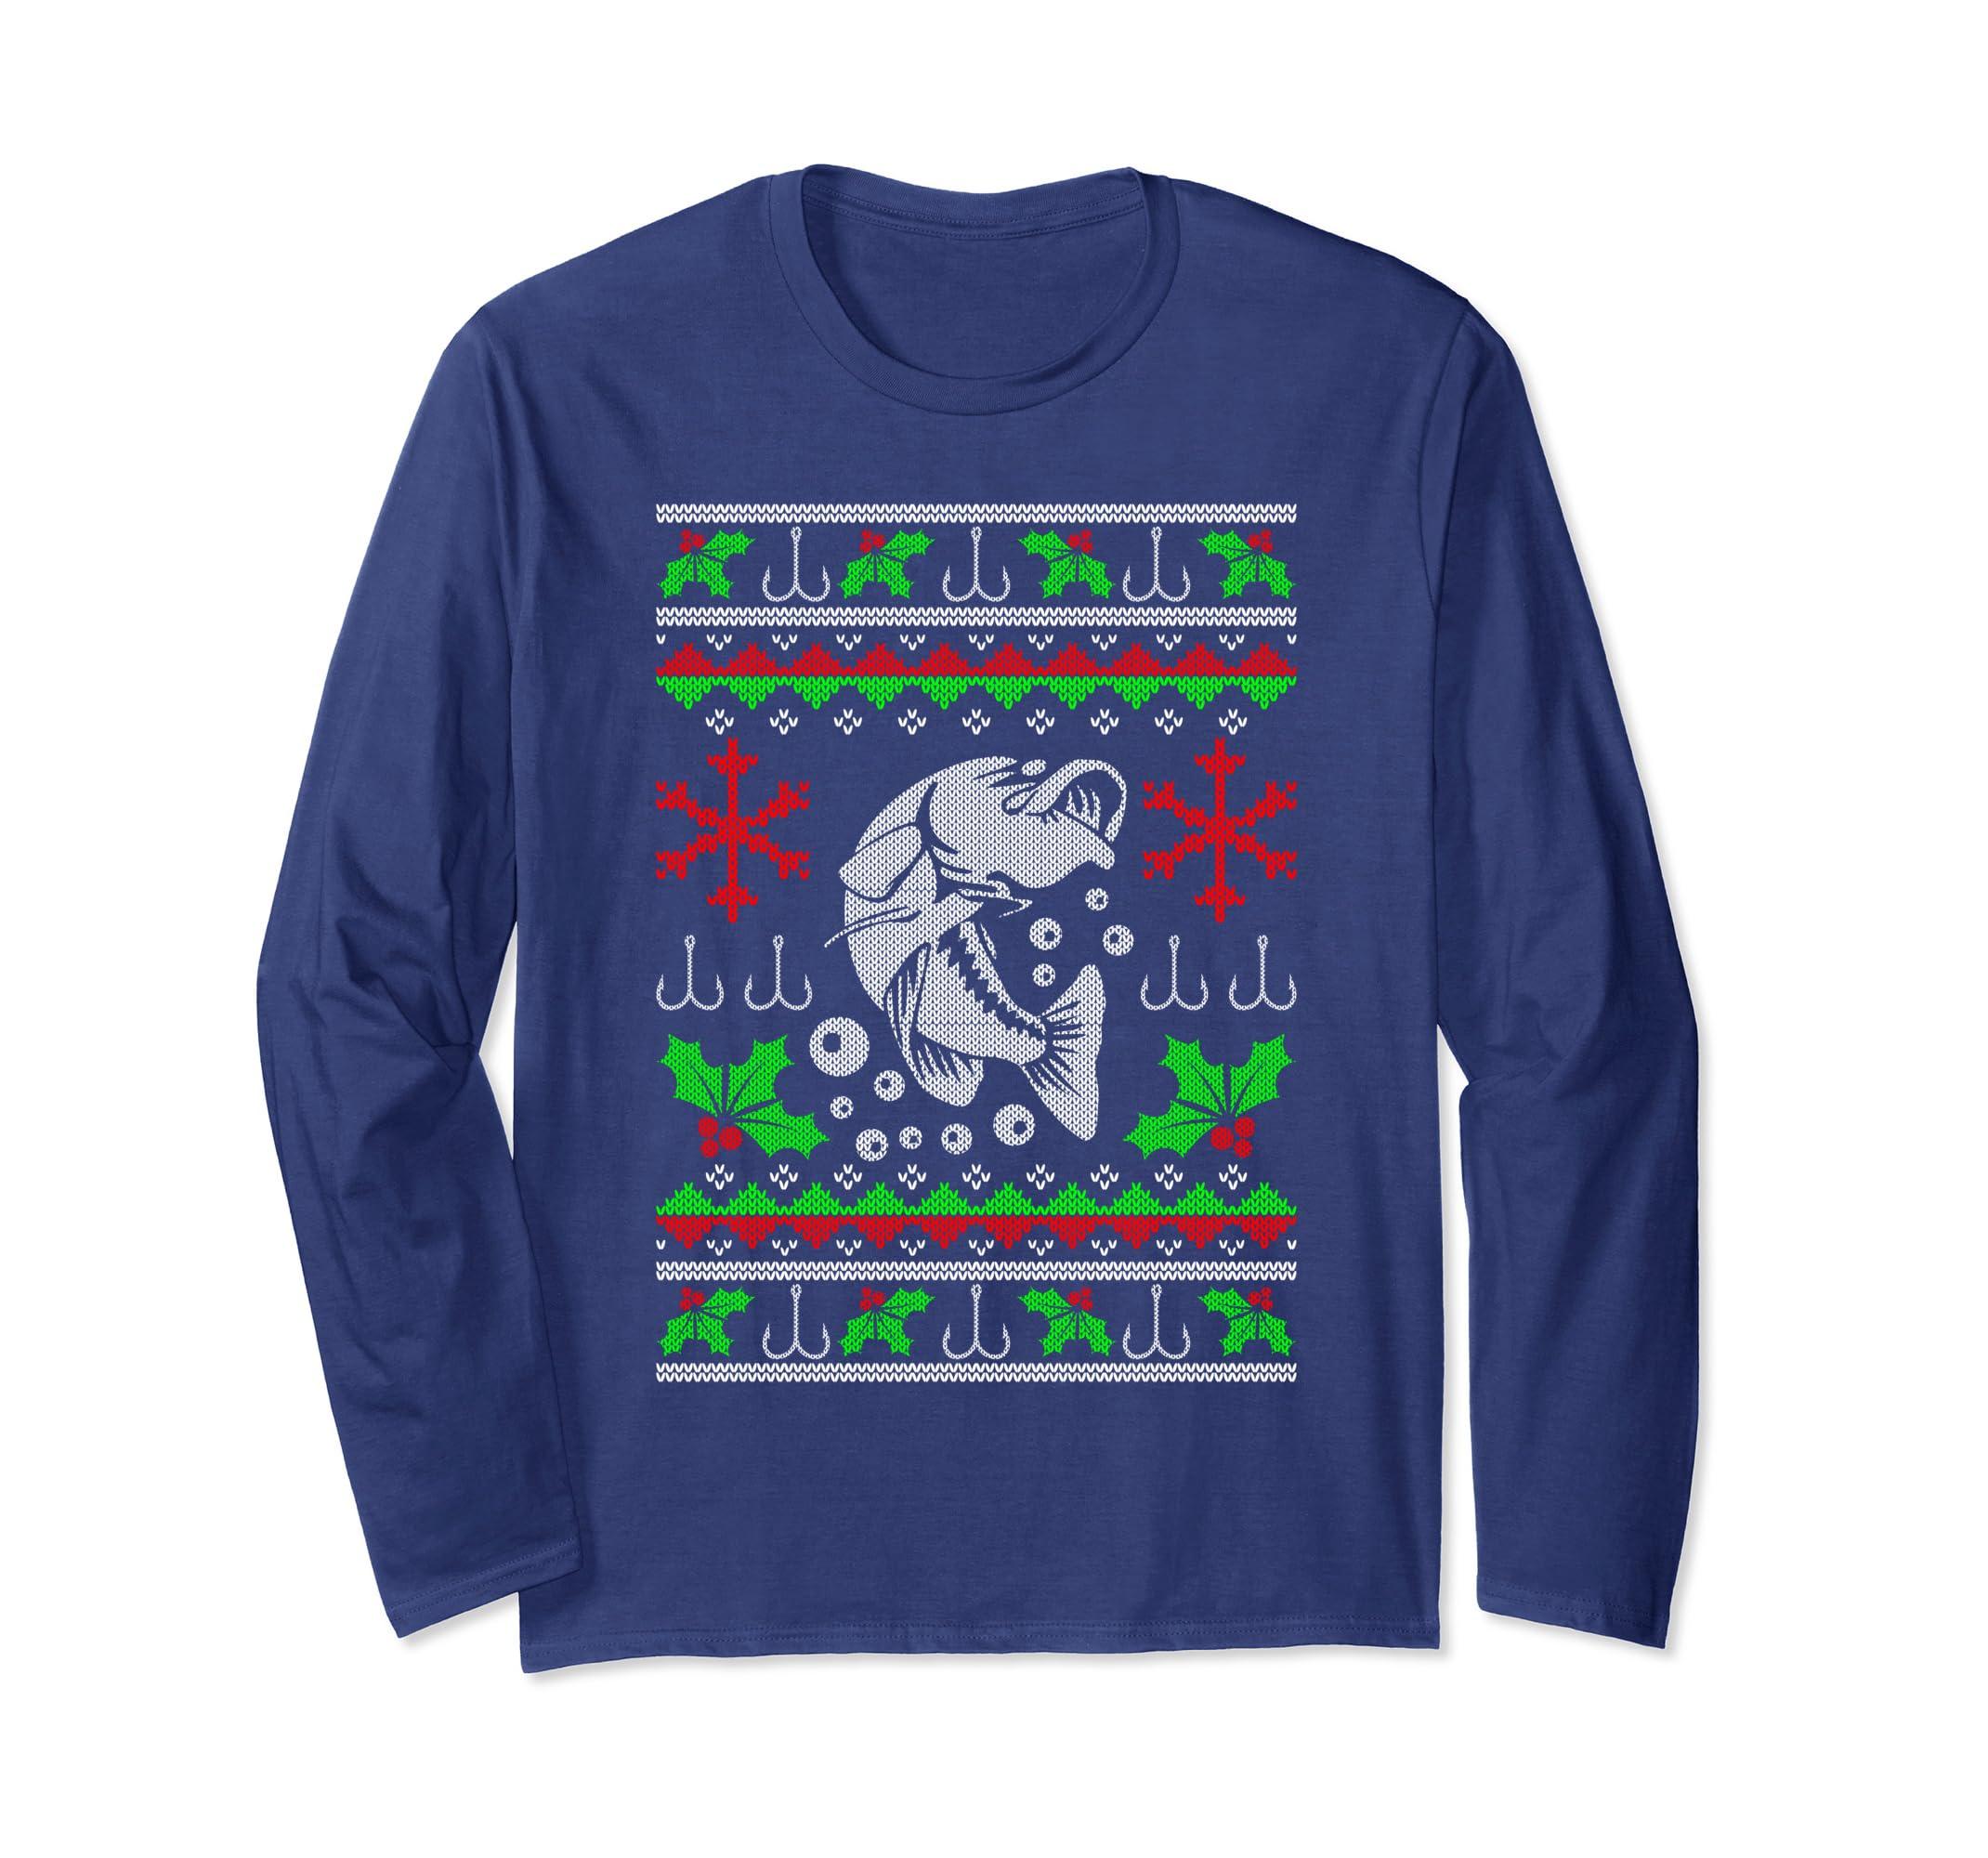 7f20c96cda7b7 Amazon.com: Fisherman's Ugly Christmas Sweater Style Fishing Bass Shirt:  Clothing